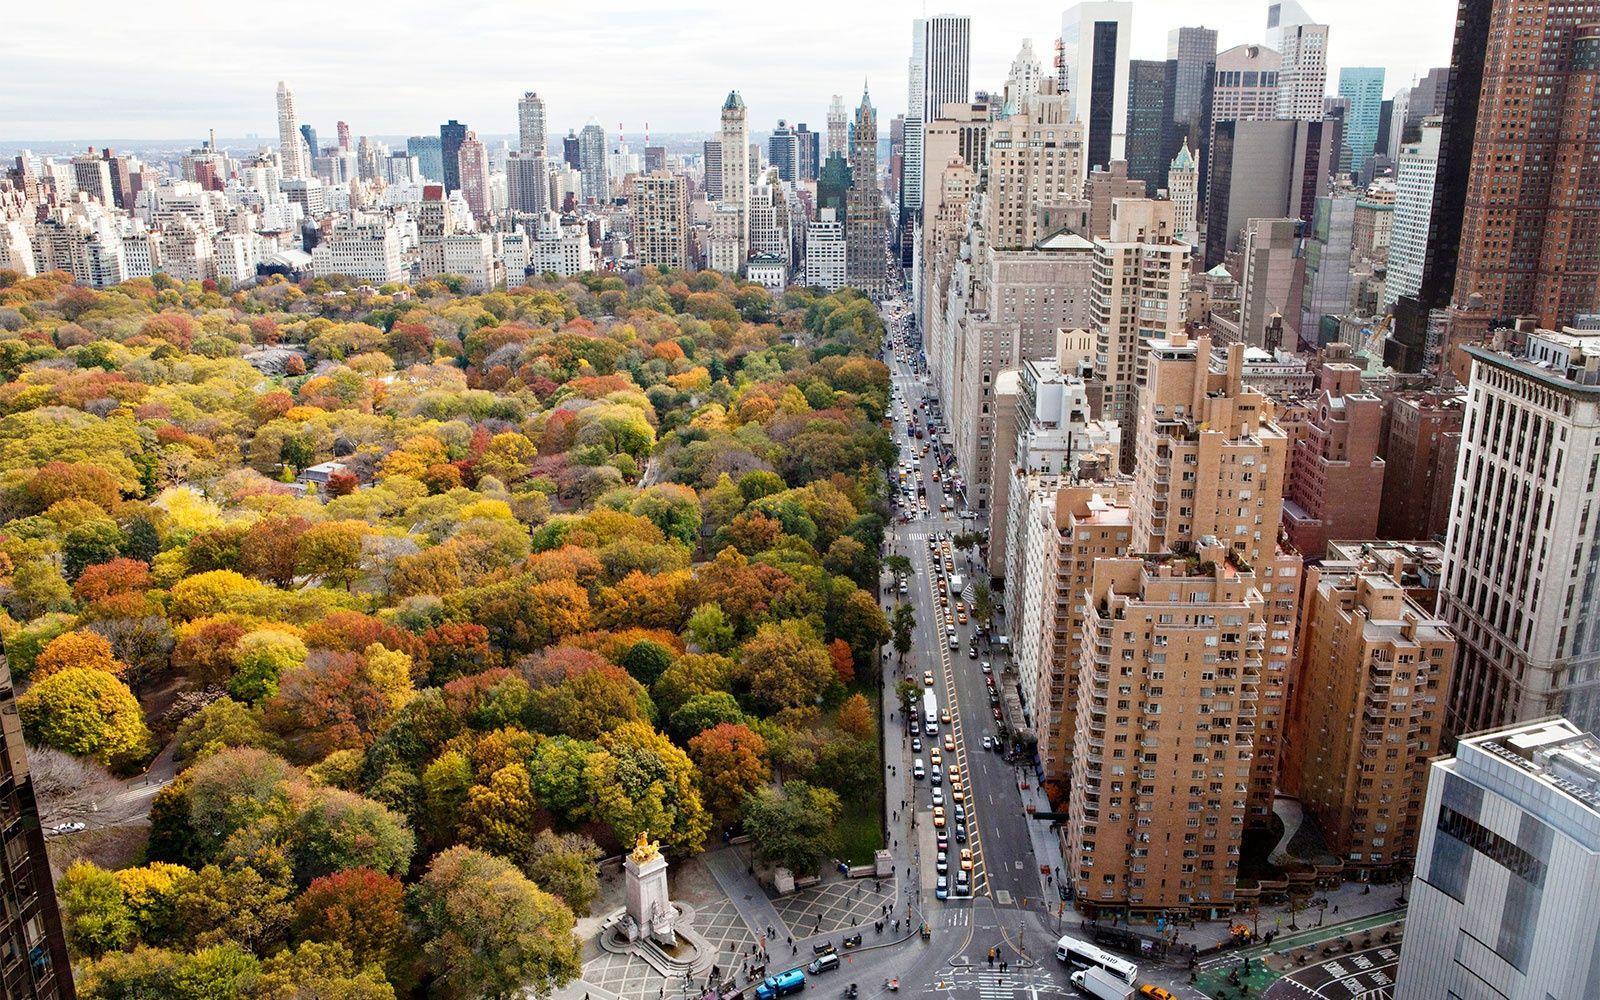 new york city fall에 대한 이미지 검색결과